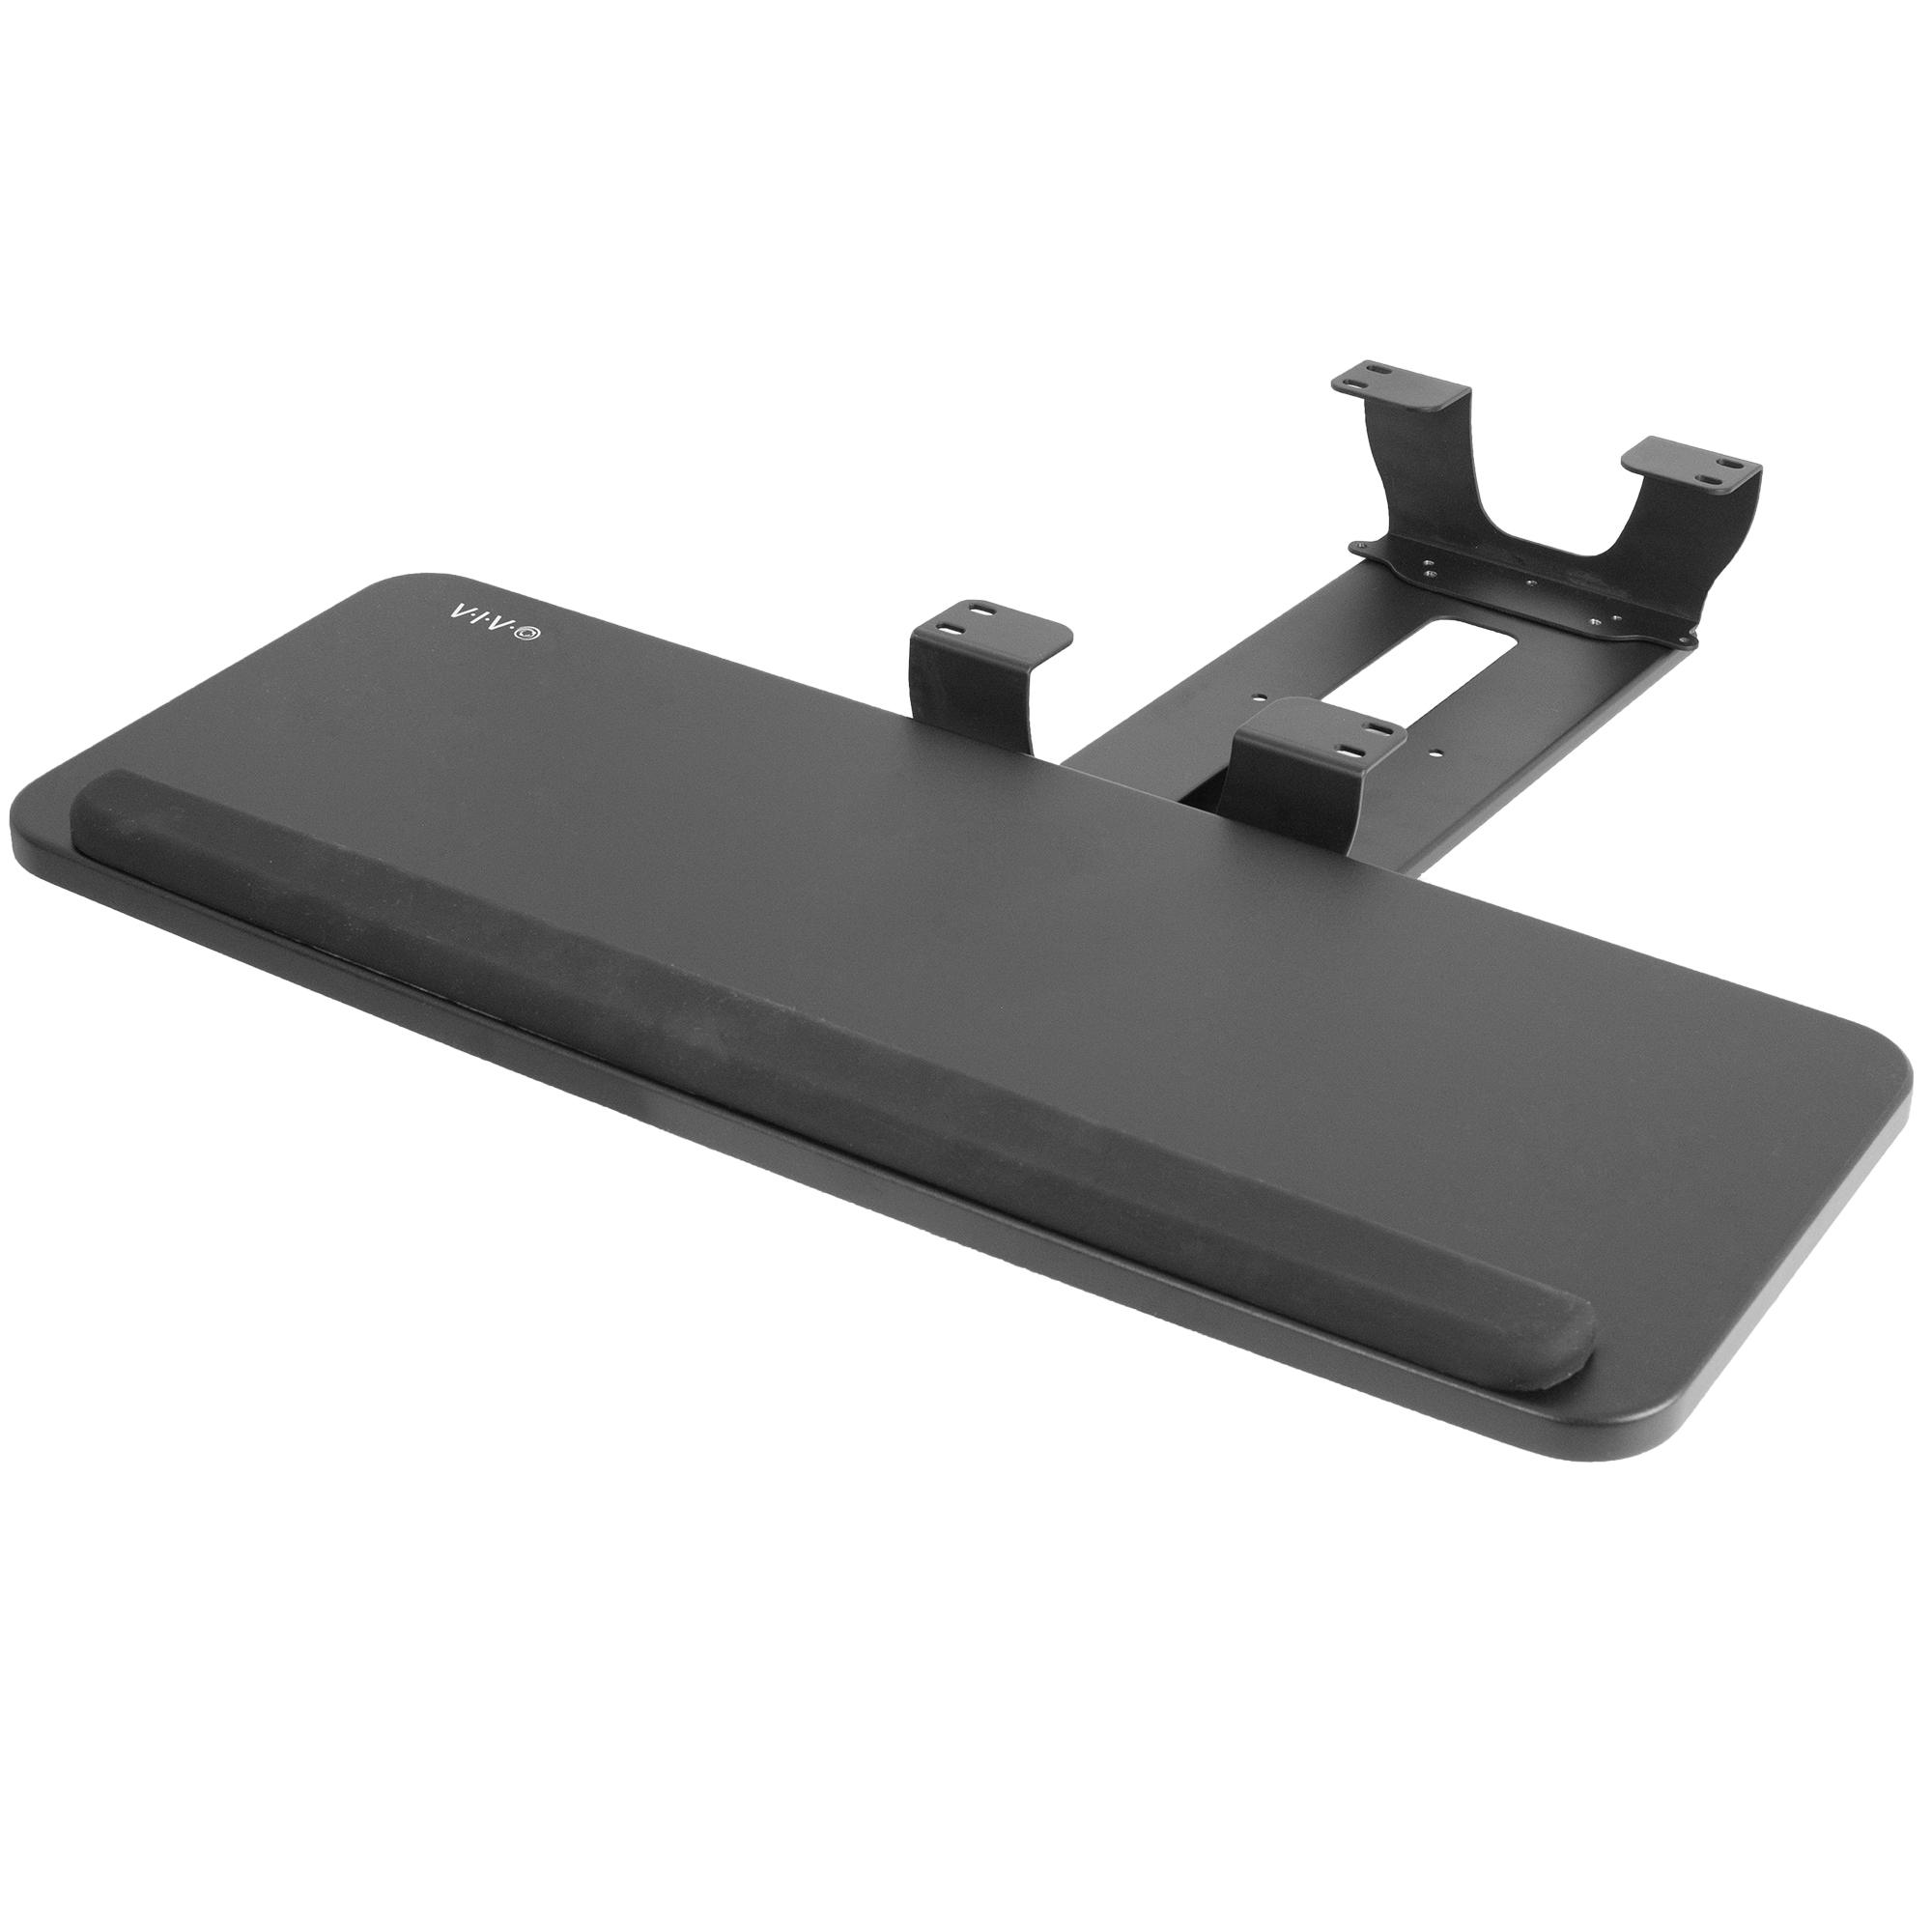 Ergonomic Under Desk Platform and Spacer Bracket Combo MOUNT-KB03B-KIT1 VIVO Adjustable Keyboard /& Mouse Tray with Dual Height Track Spacer Brackets